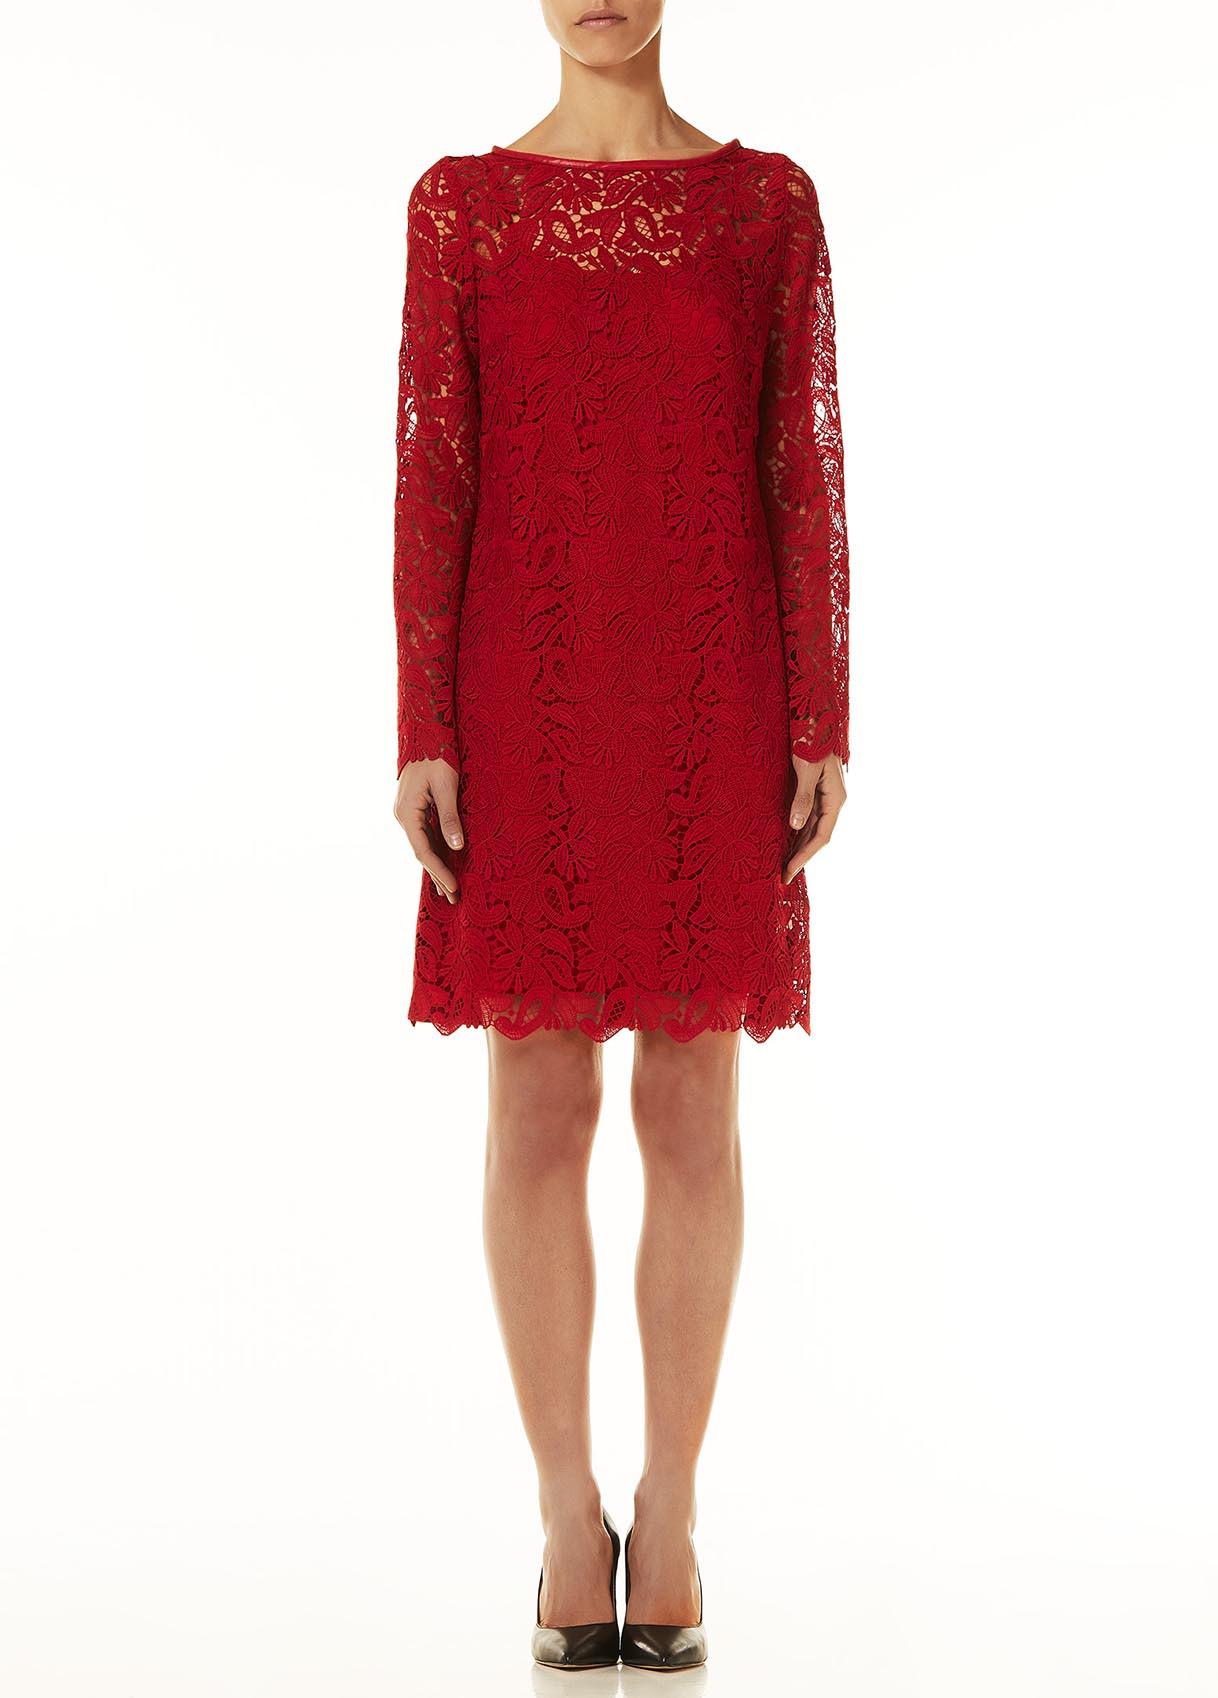 13 Einzigartig Kurzes Kleid Mit Spitze Stylish10 Leicht Kurzes Kleid Mit Spitze Design